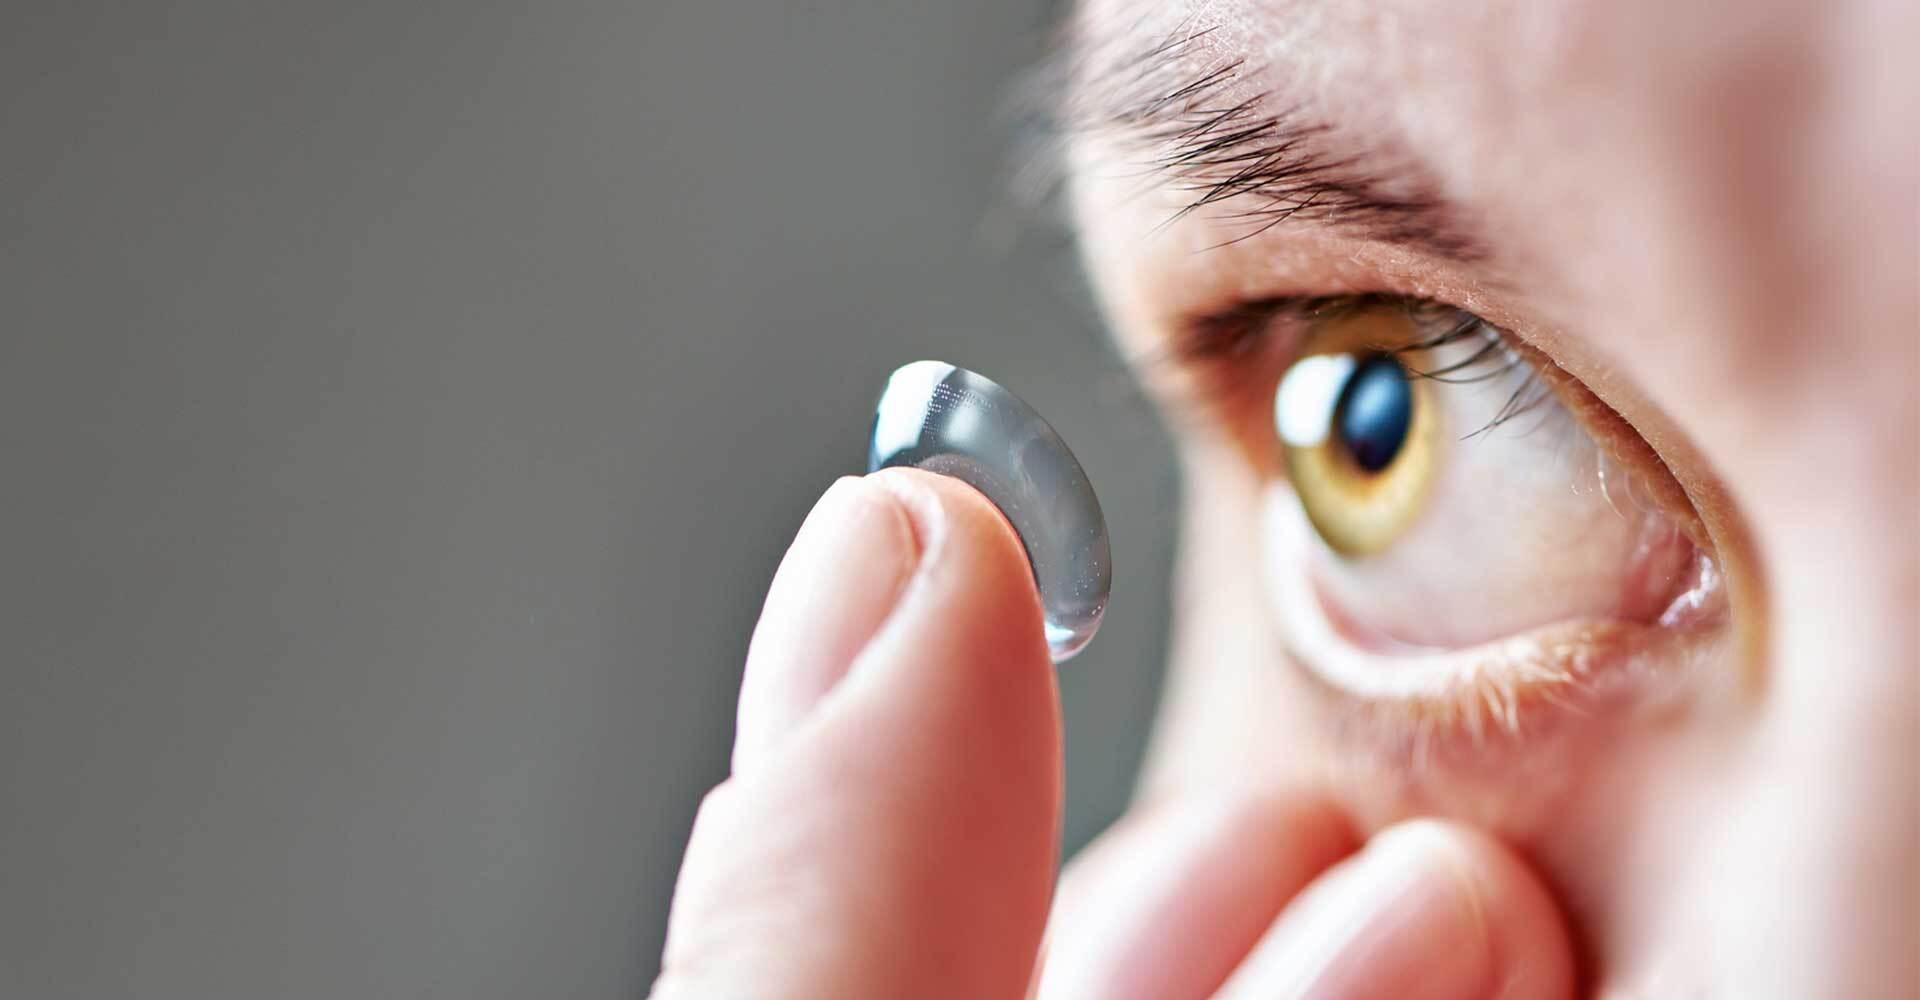 The Eye Galleria Opticians